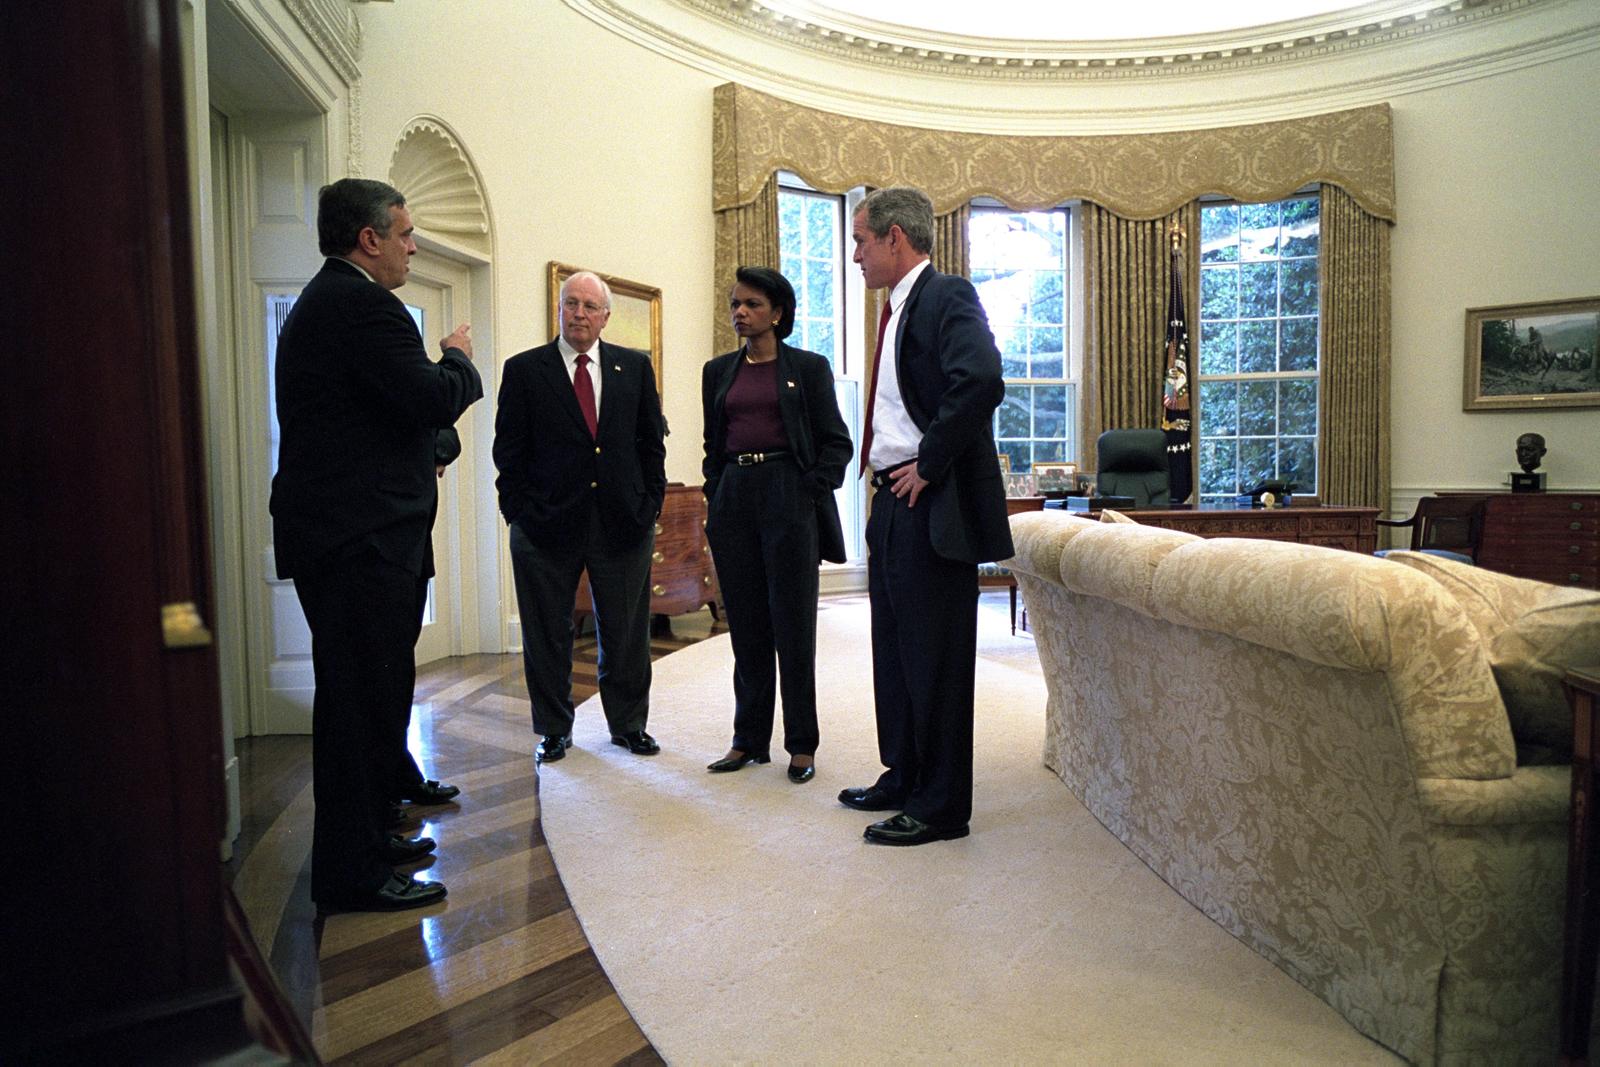 george bush oval office. 911: President George W. Bush With Senior Officials In Oval Office George Bush Oval Office